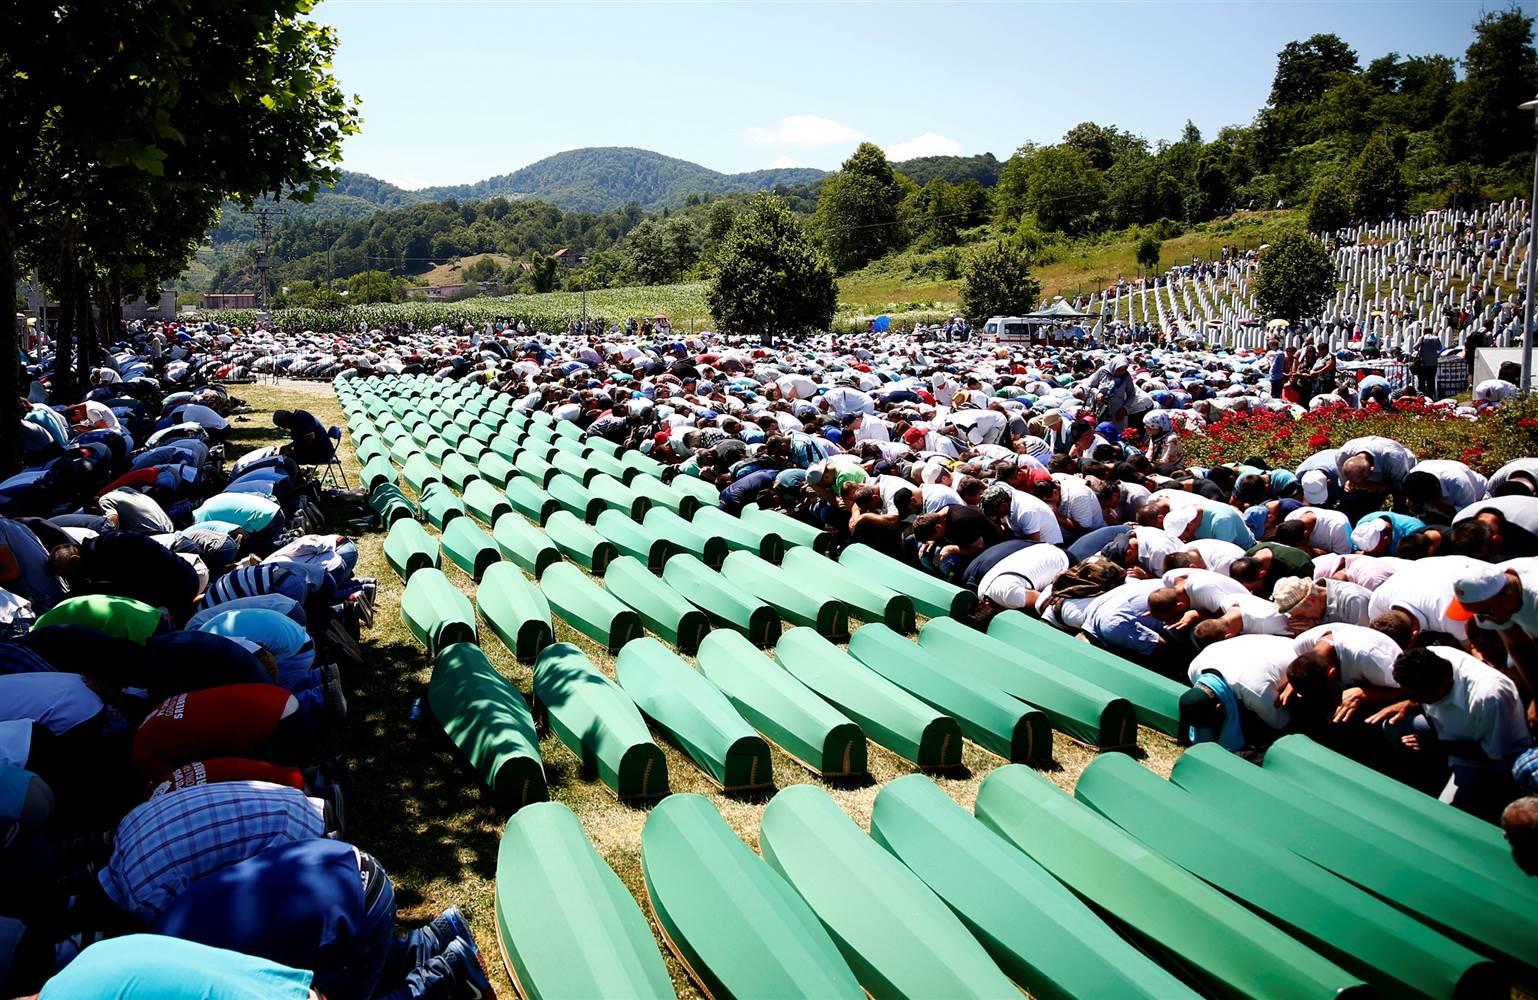 Edward S. Herman: The Srebrenica Massacre was a Gigantic Political Fraud